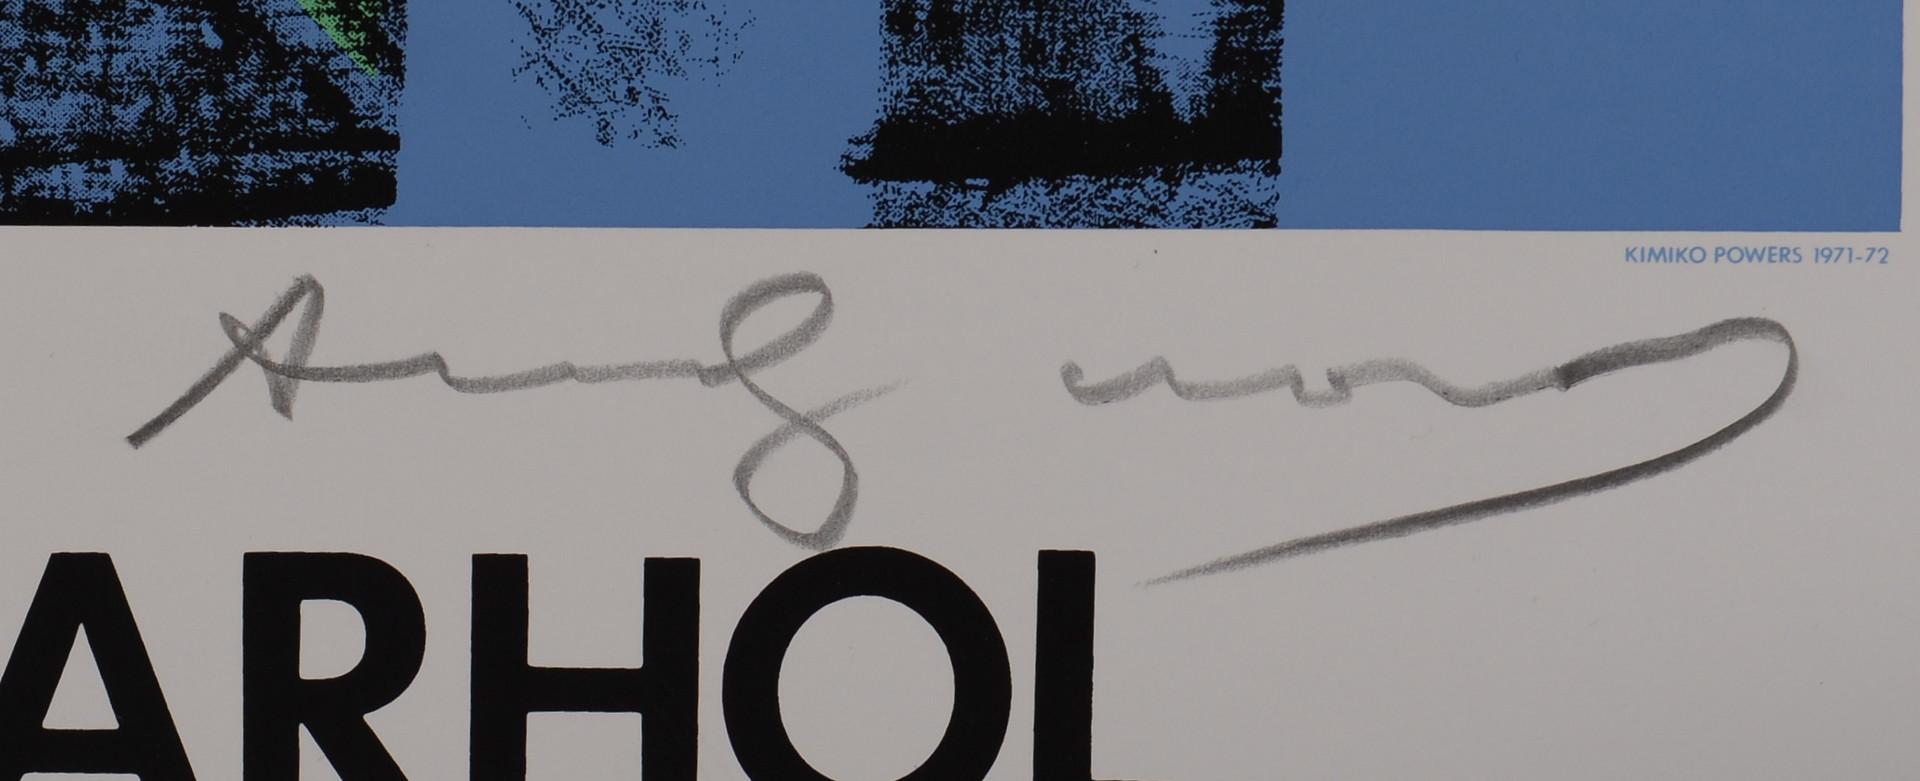 Lot 507: Andy Warhol Screenprint, Kimiko Powers